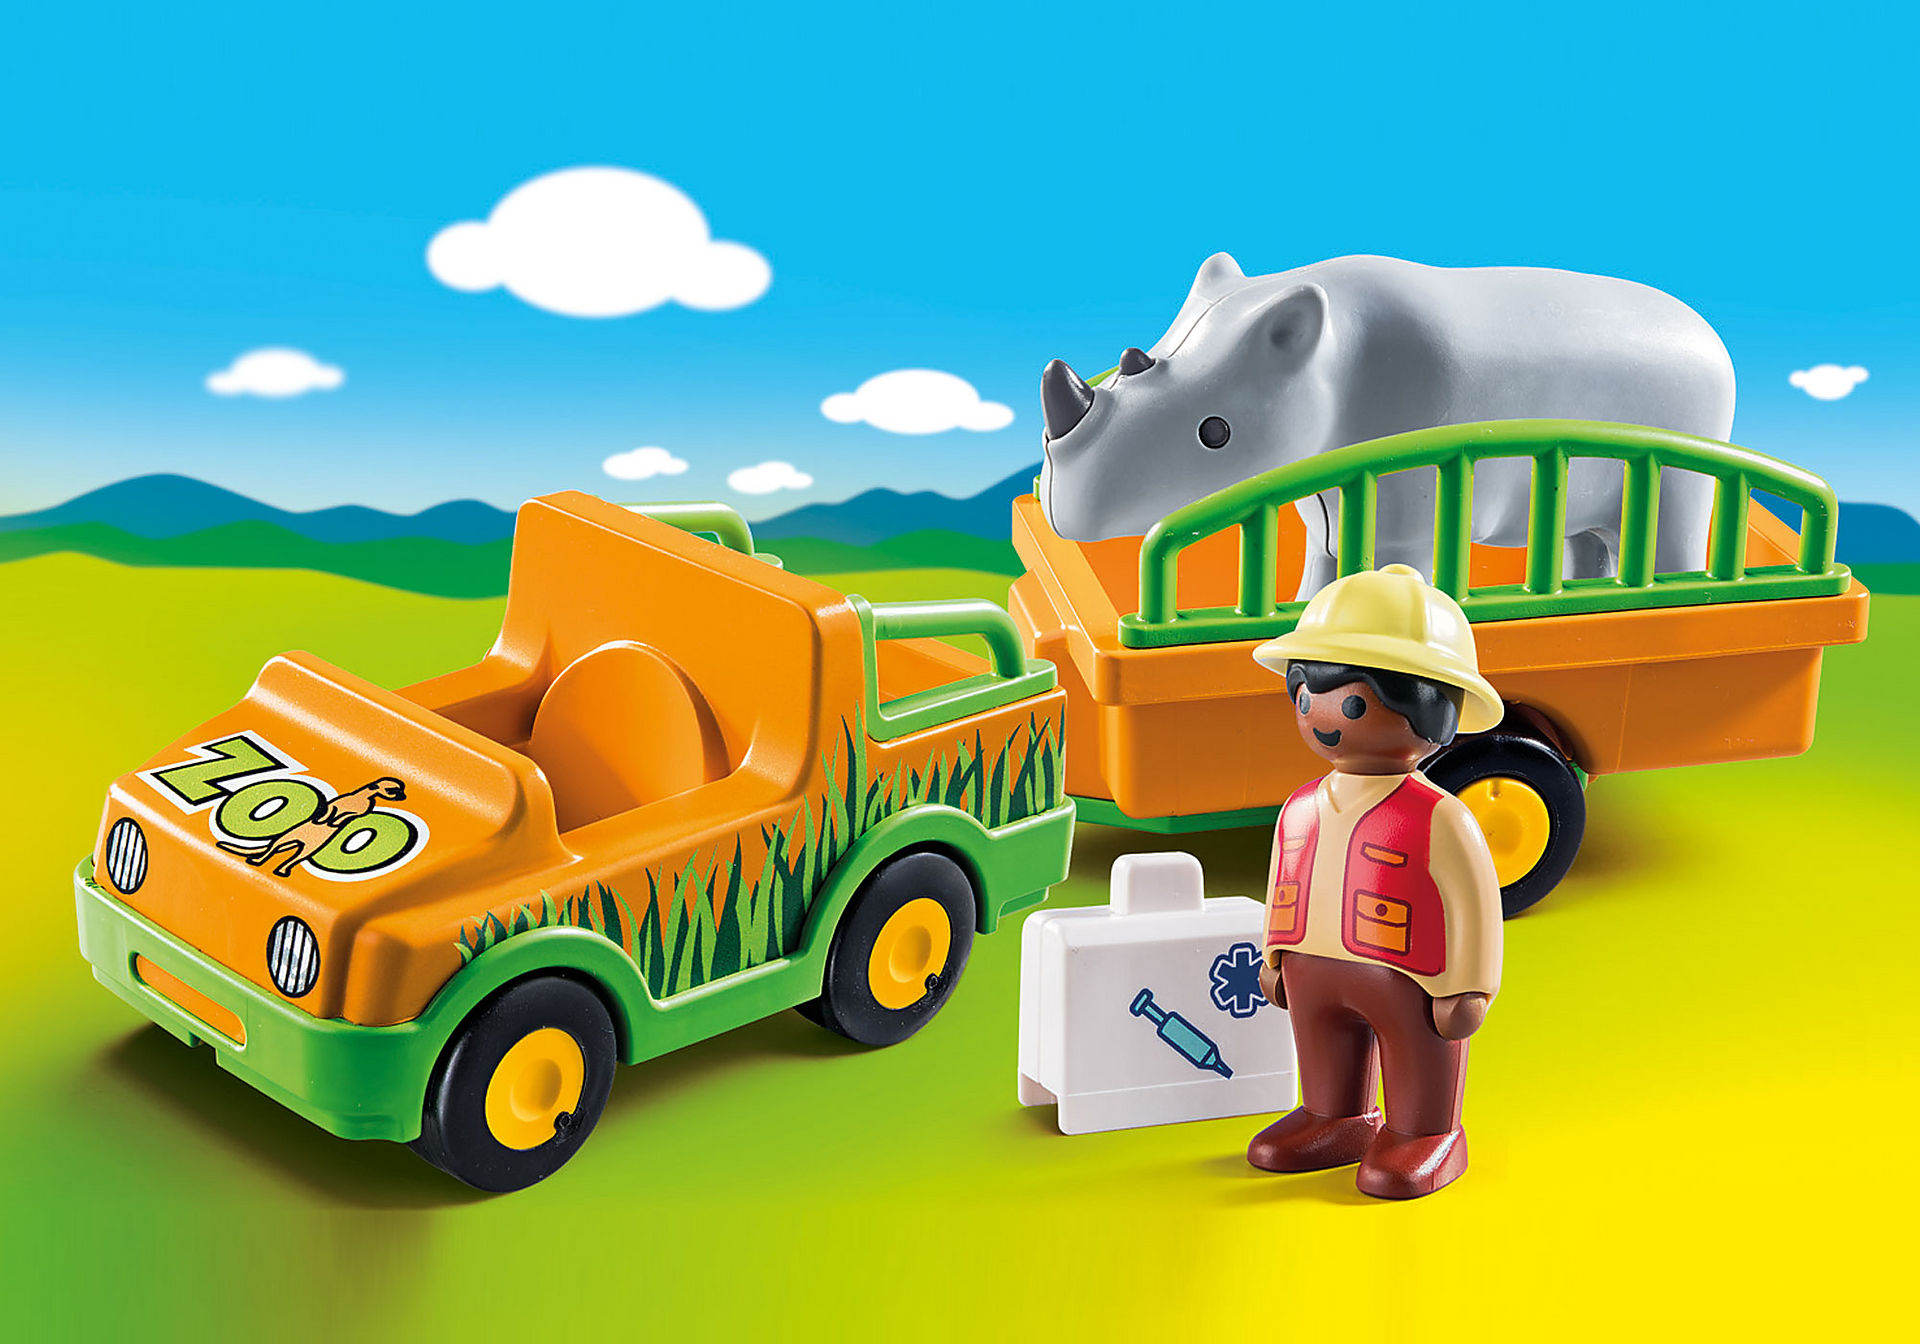 http://media.playmobil.com/i/playmobil/70182_product_detail/Vétérinaire avec véhicule et rhinocéros